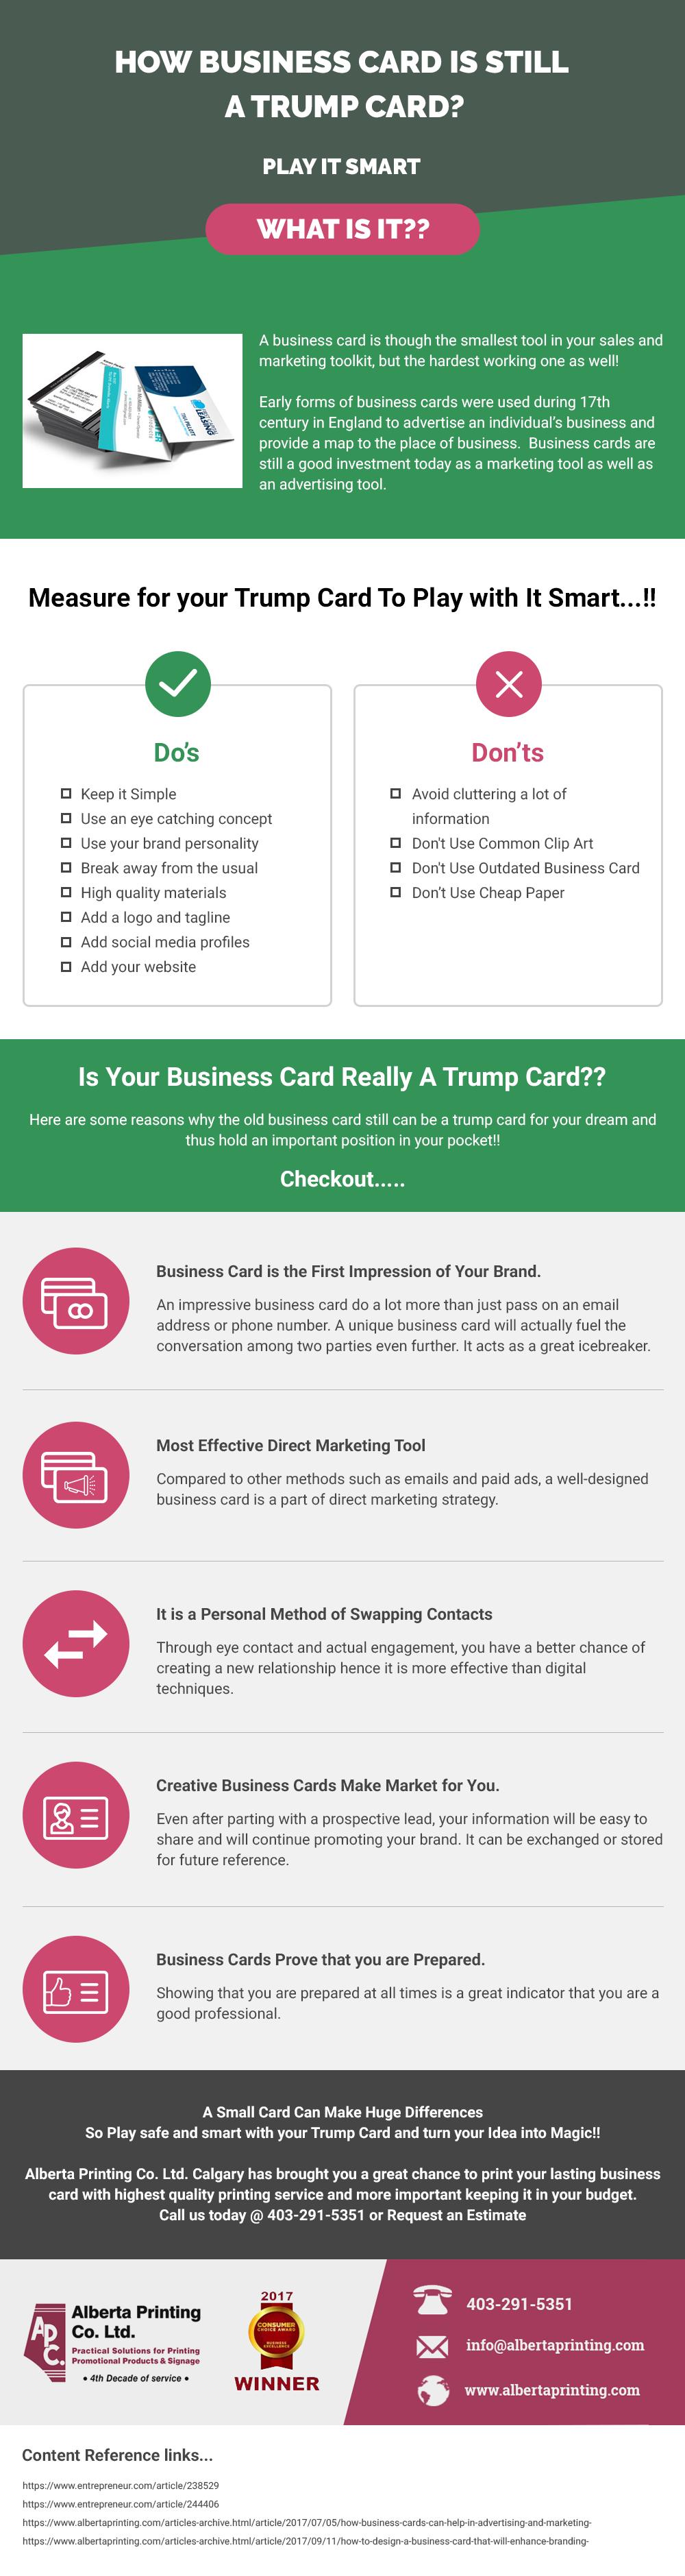 How Business Card is Still a Trump Card?